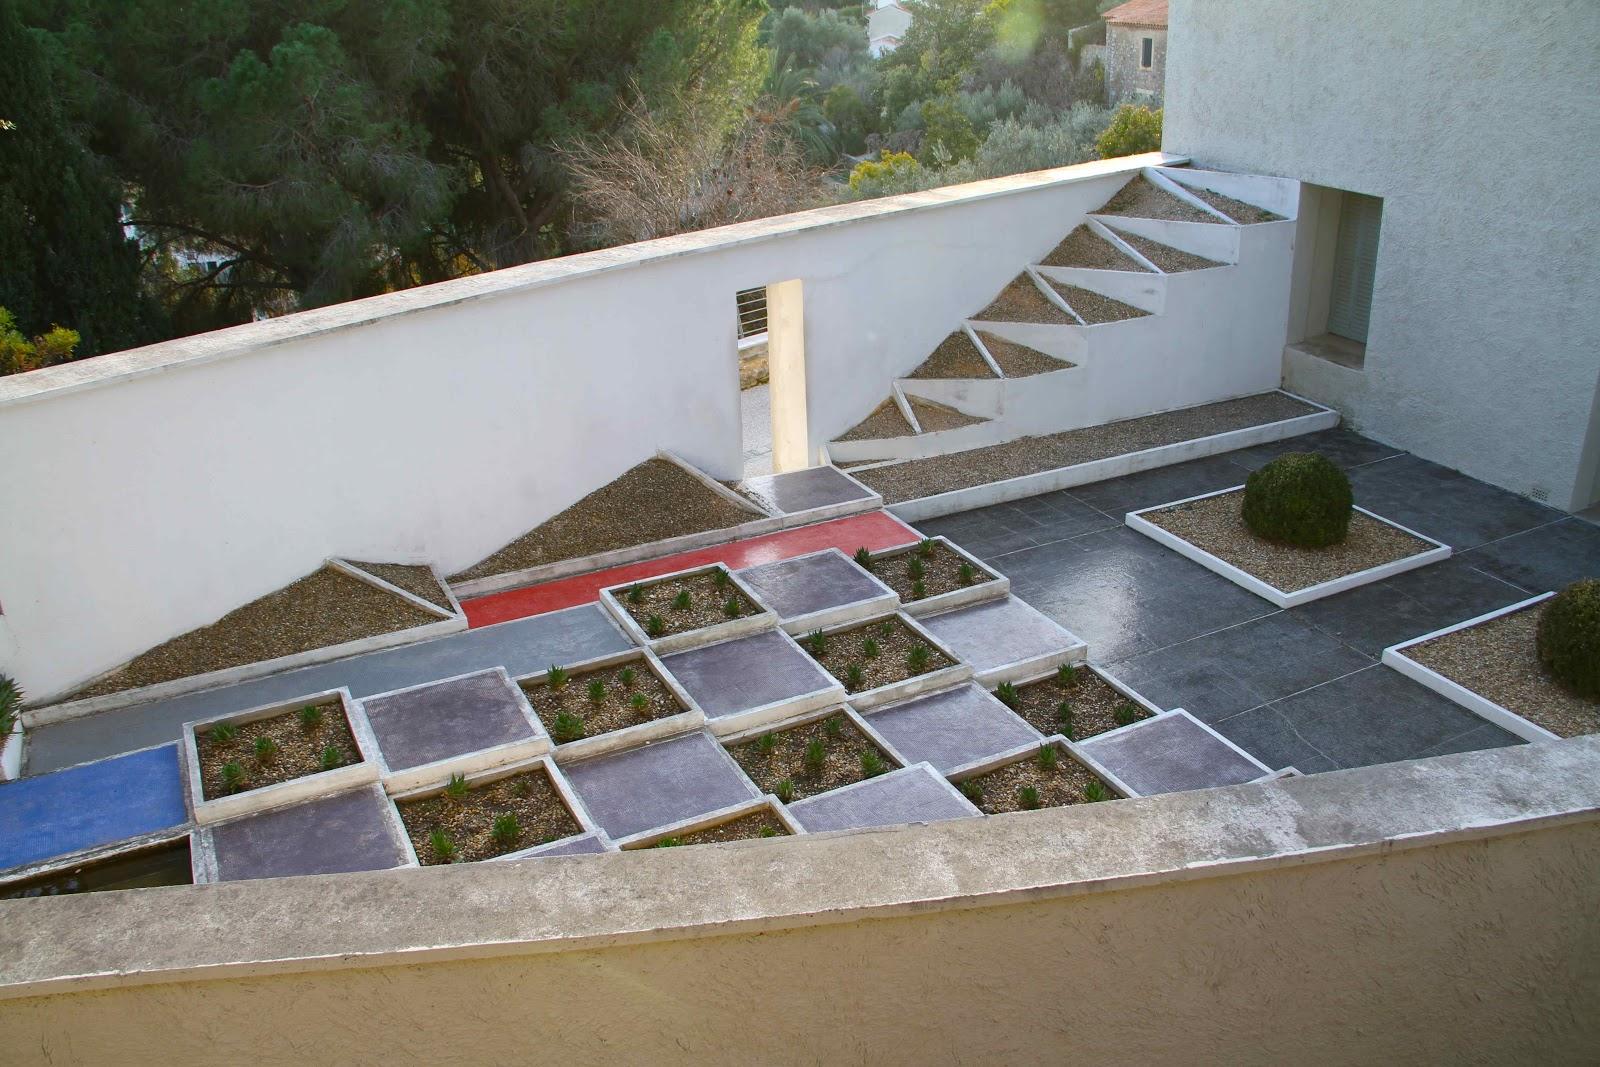 Gallery of Villa Noailles Jardin Cubiste